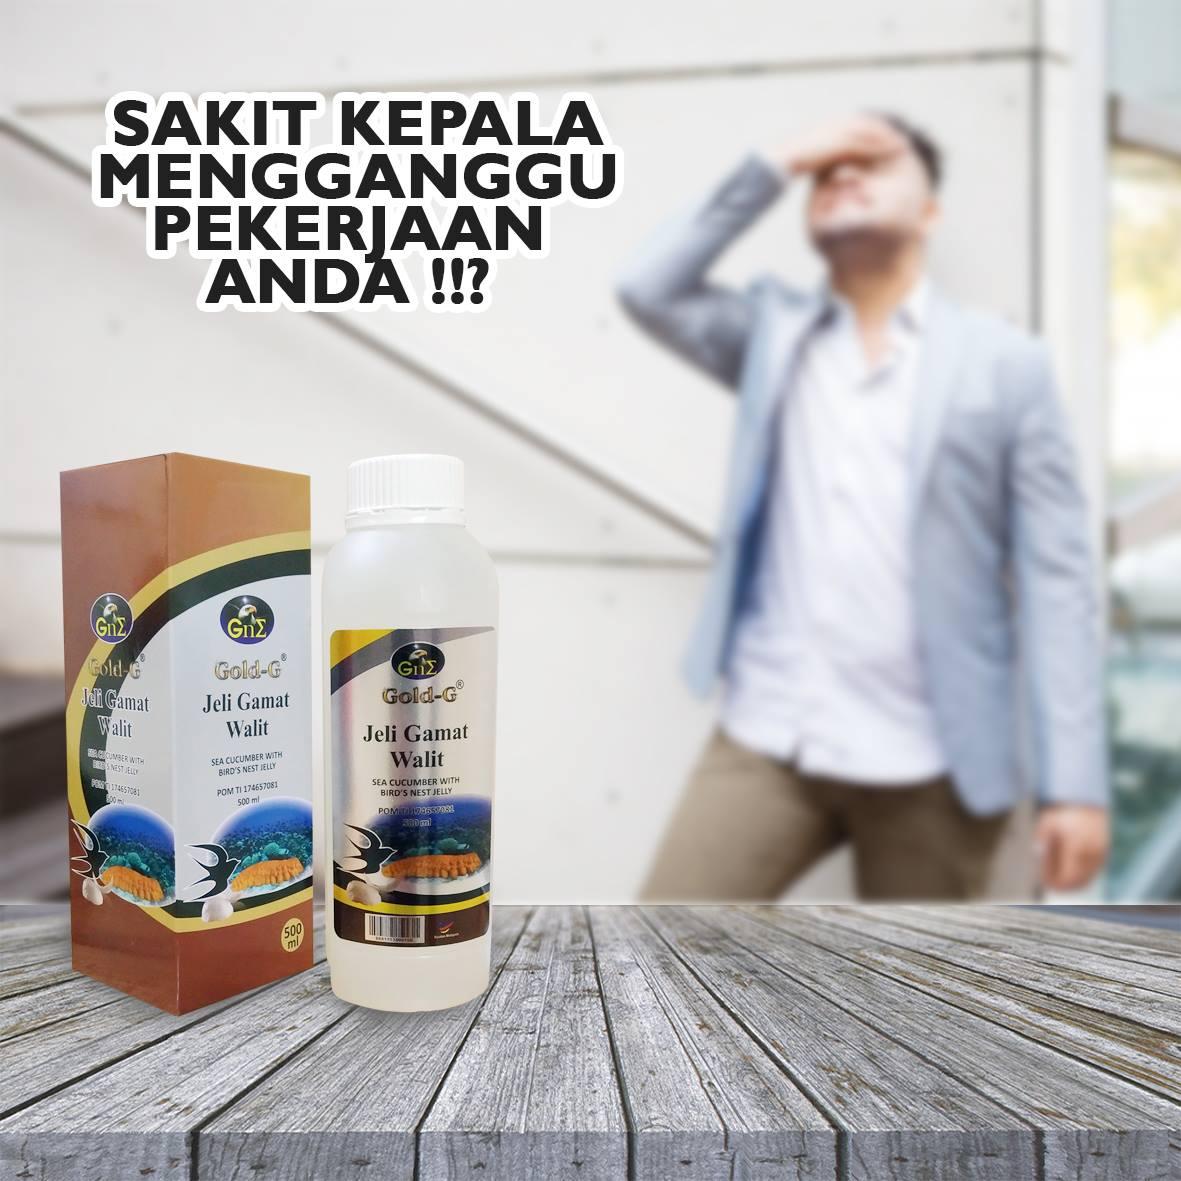 Obat Ampuh Sakit Kepala Jelly Gamat Walet Pusat Jelly